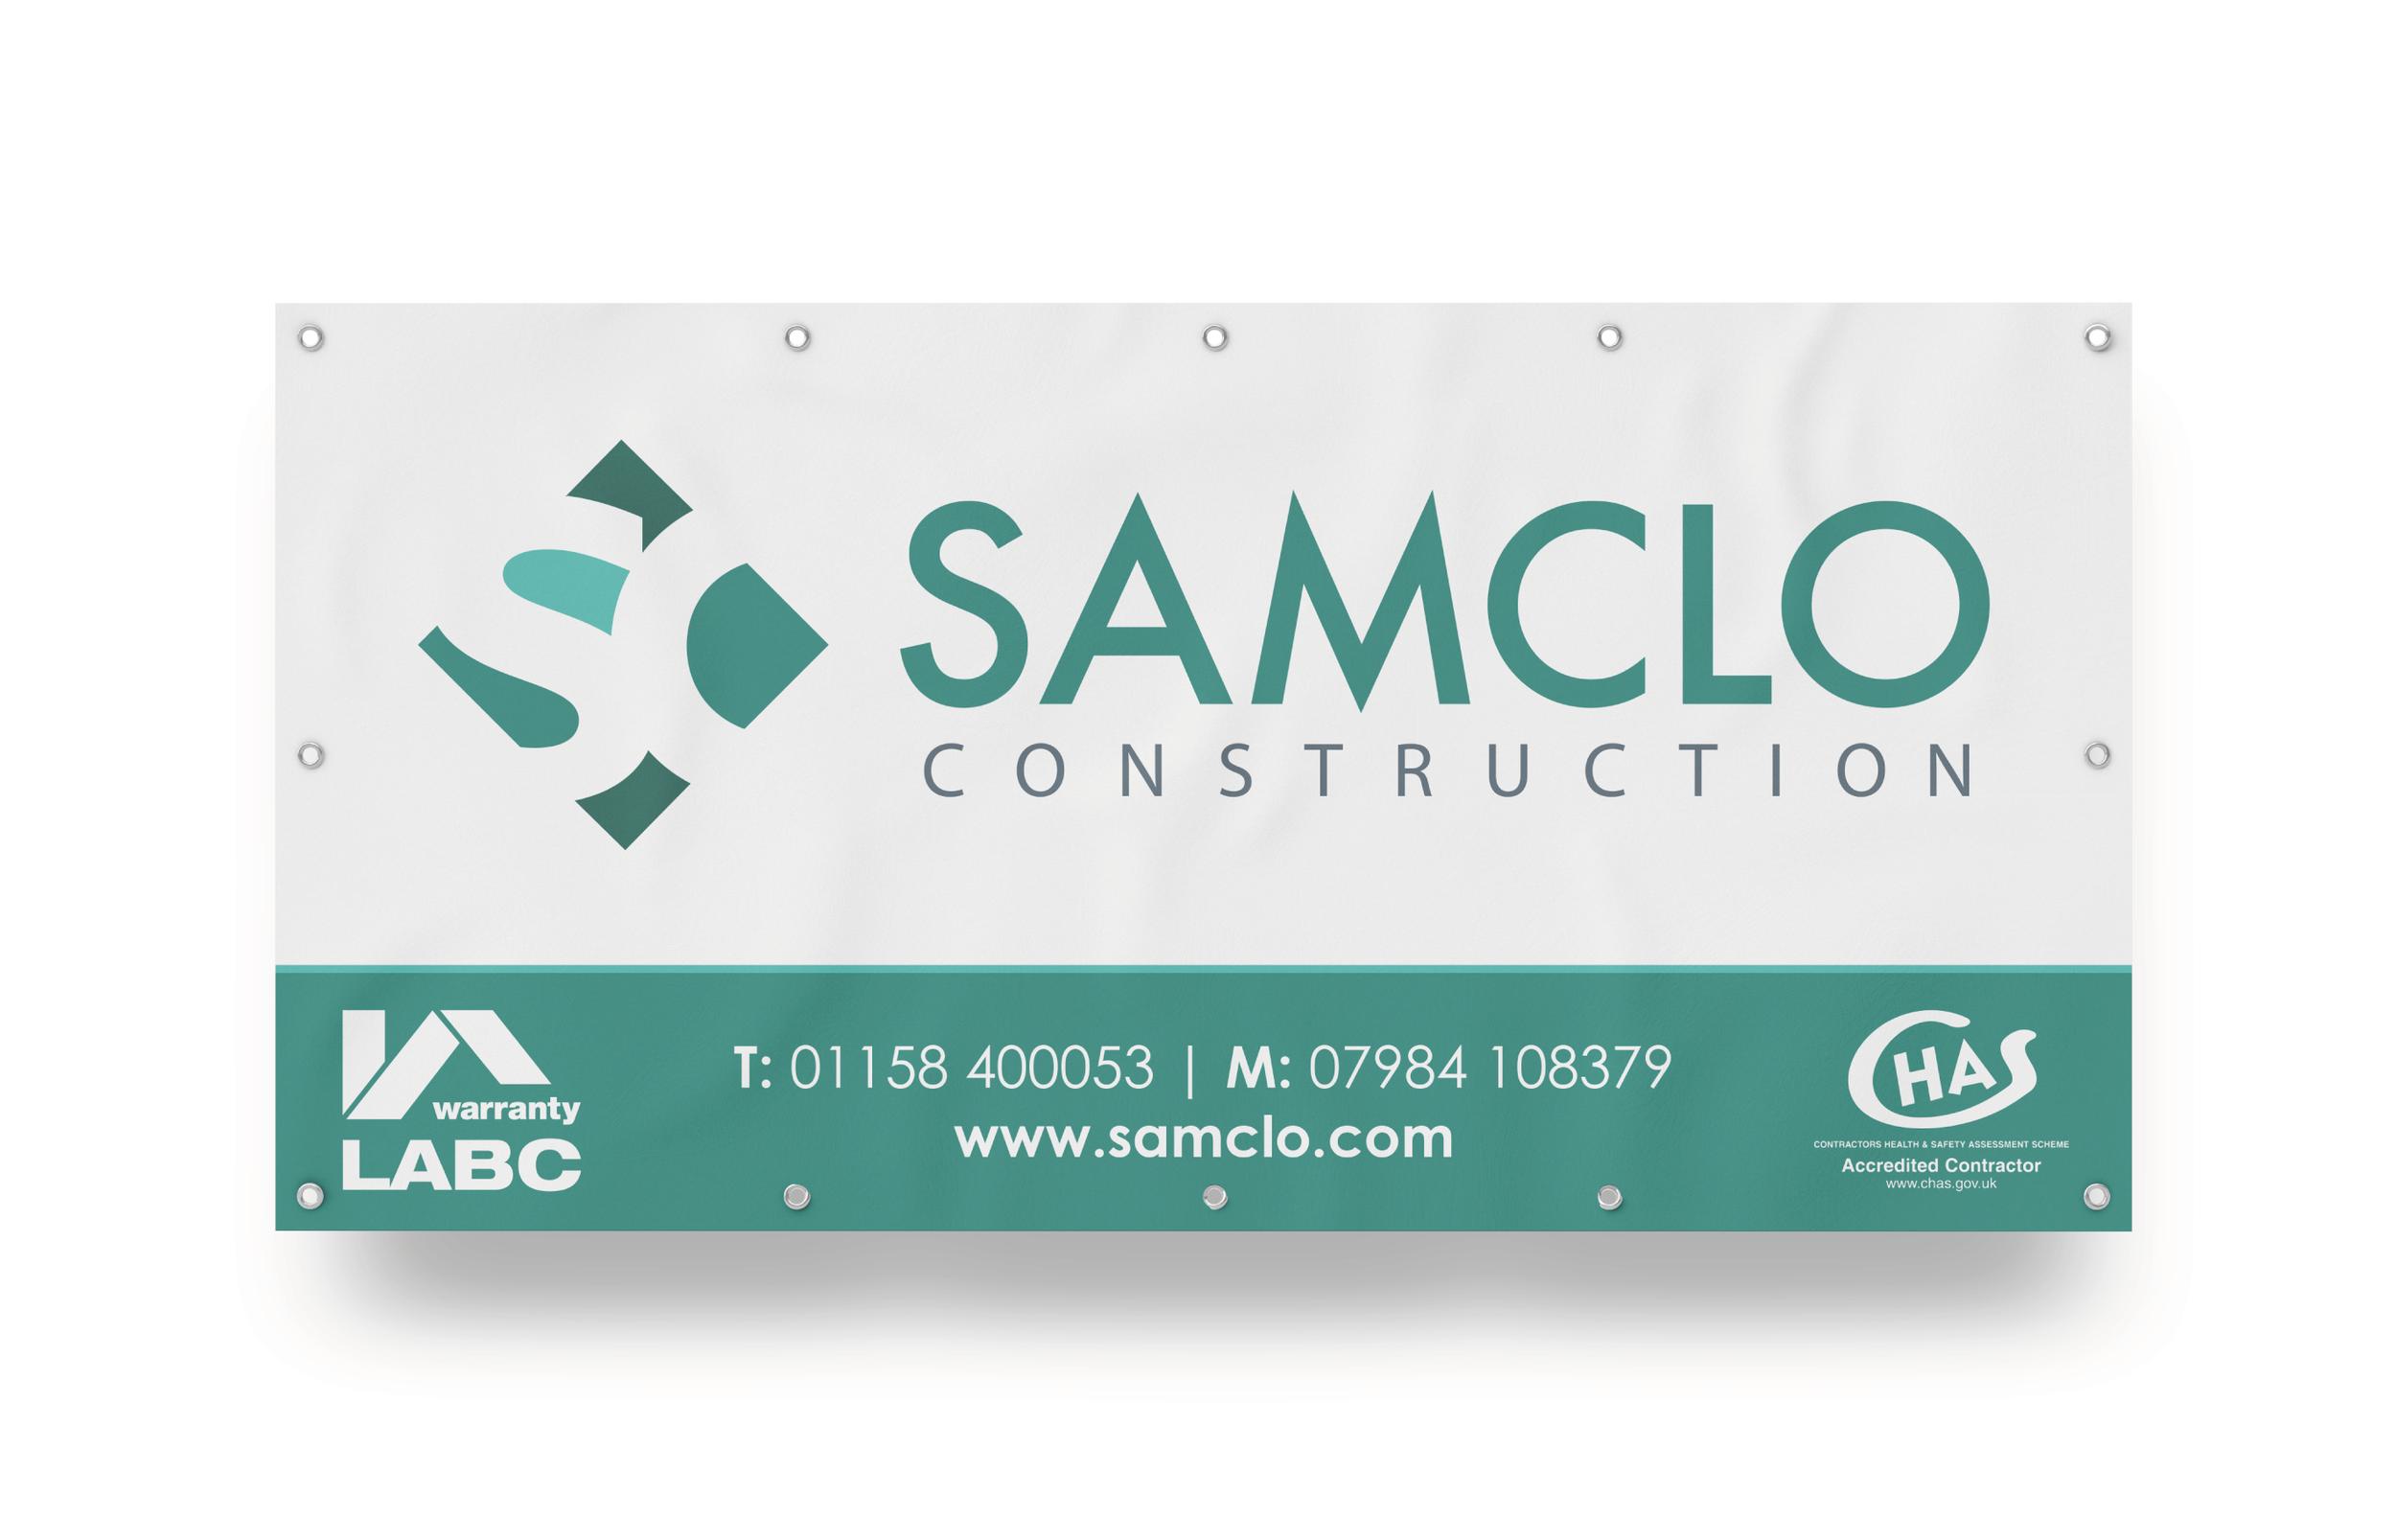 Samclo Construction PVC Banner